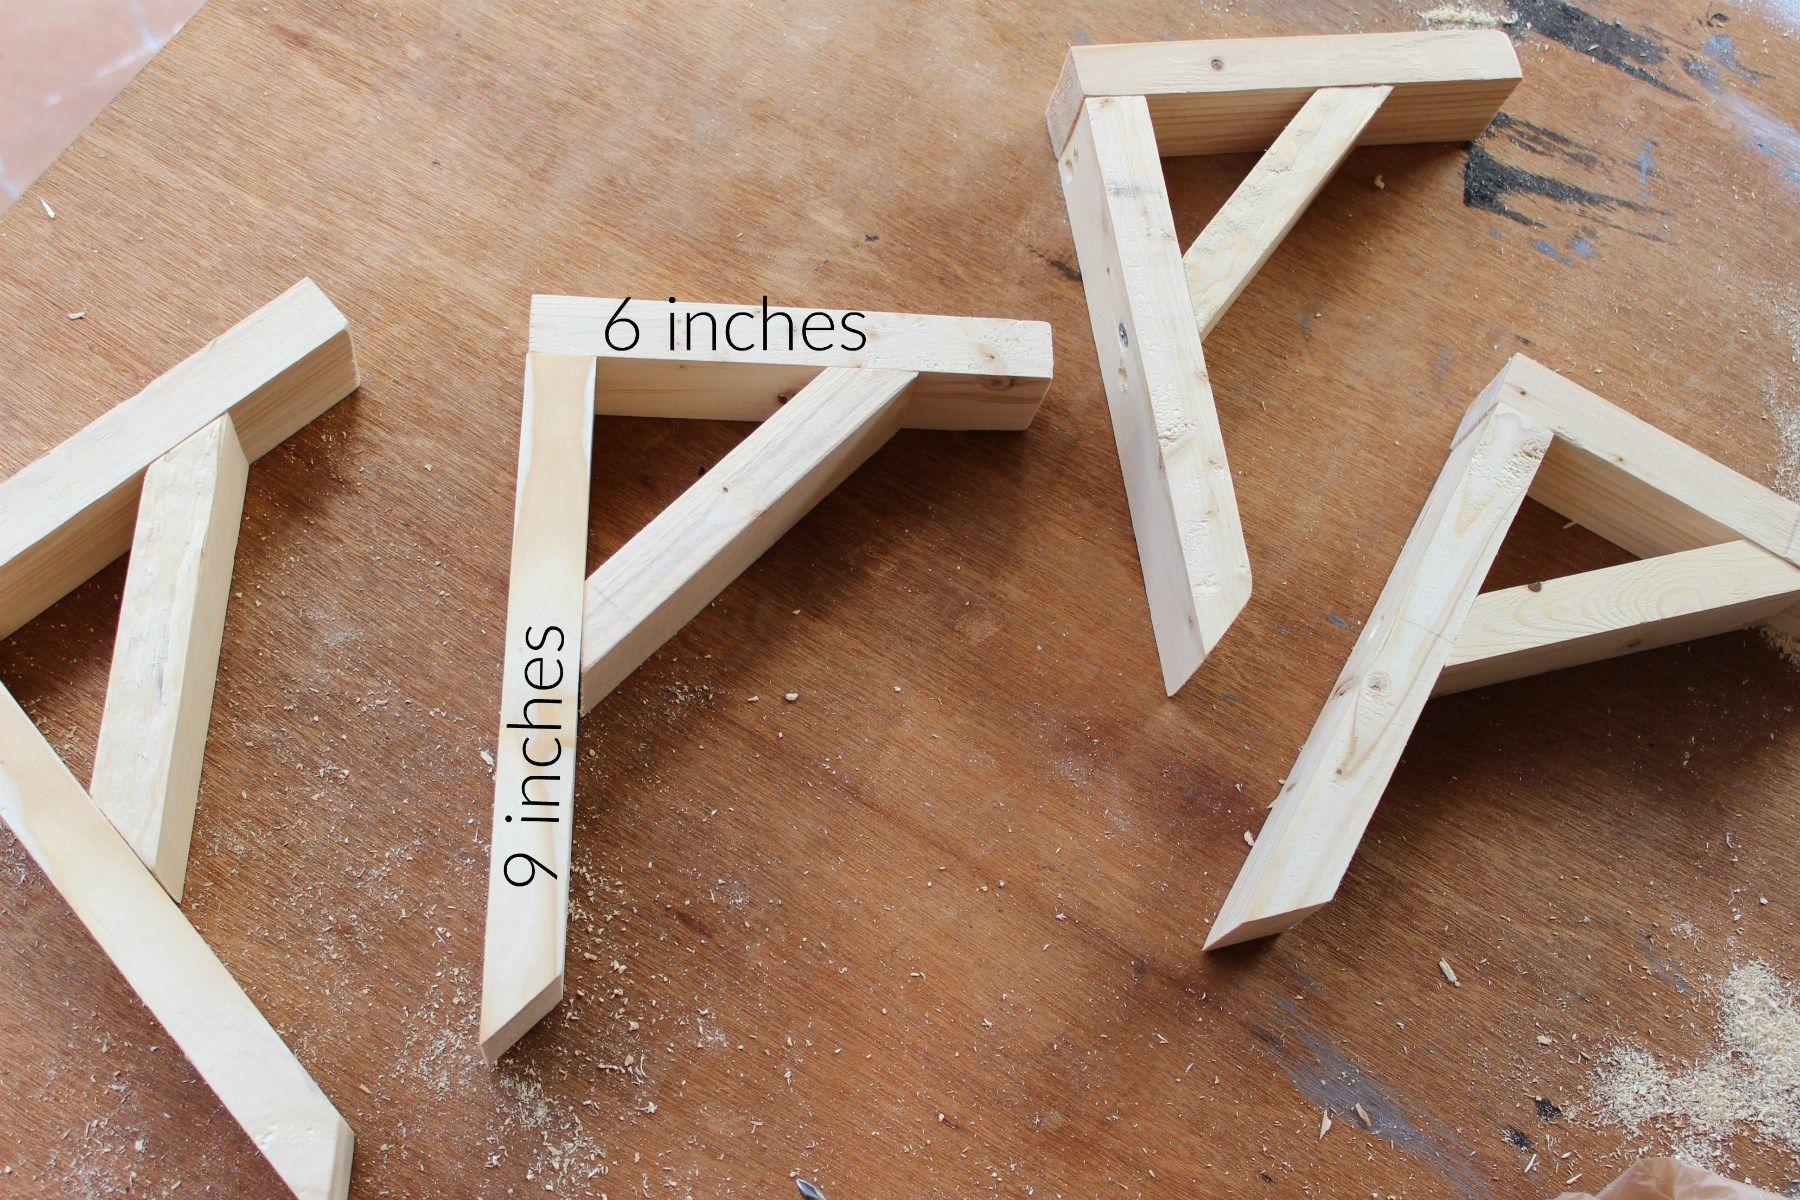 DIY Wooden Brackets measuements.jpg Diy shelf brackets